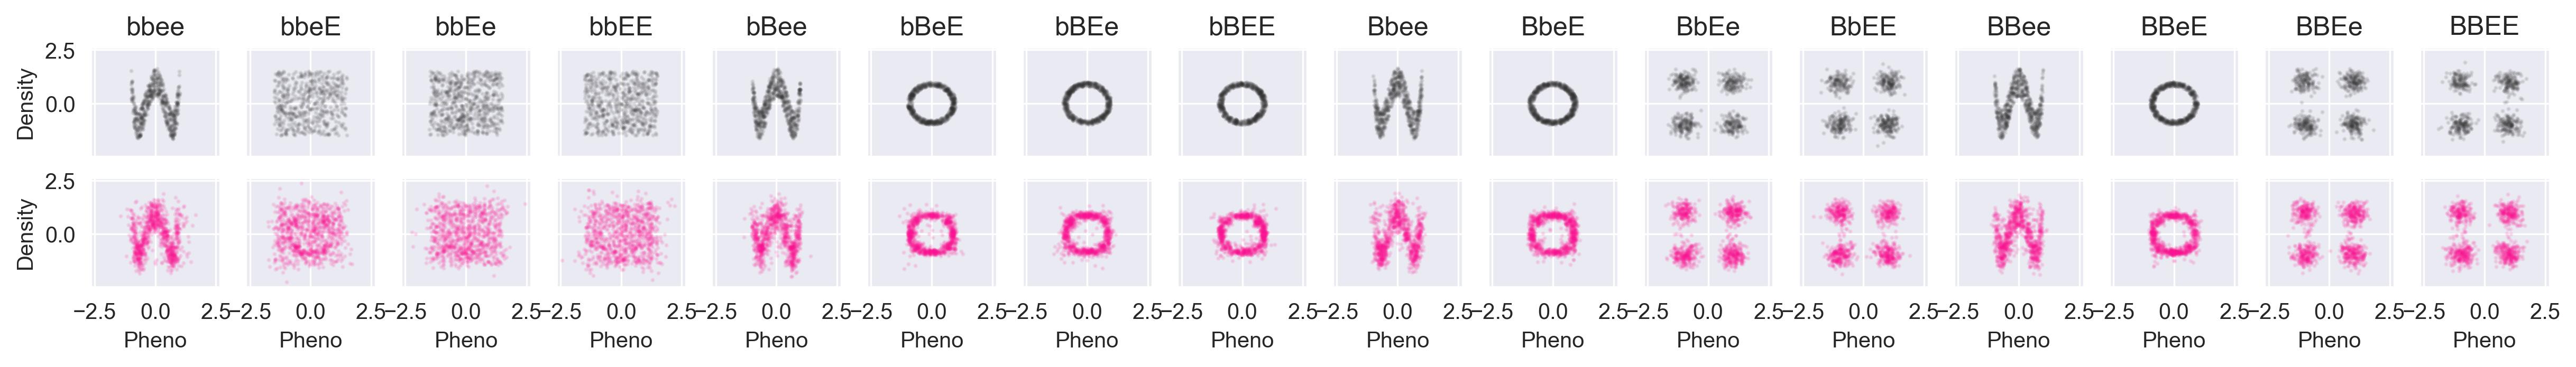 Multivariate epistatic phenotype distributions